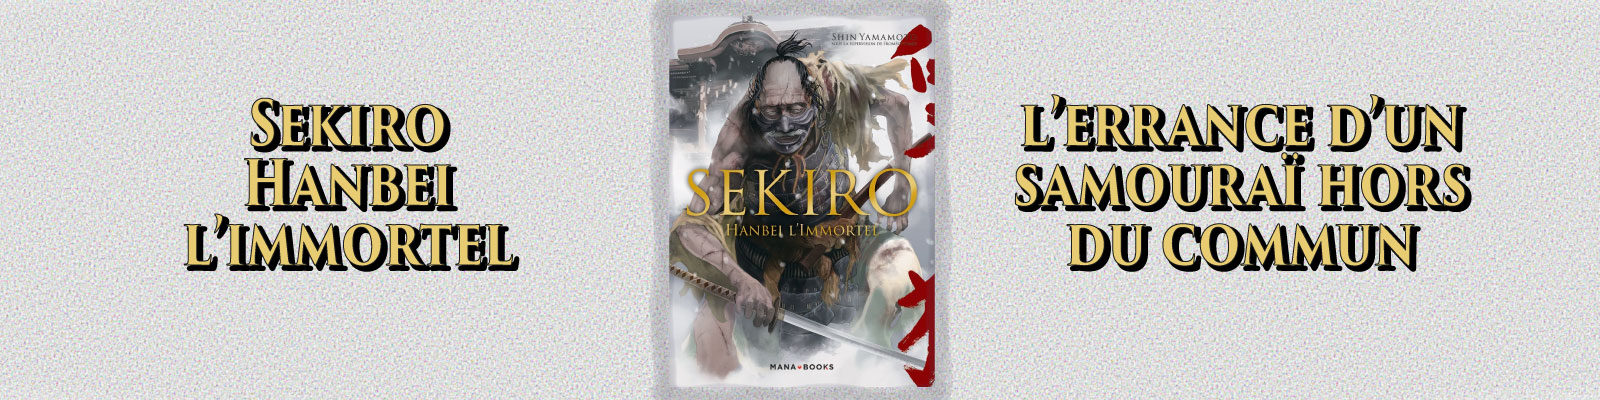 sekiro_-_hanbei_l_immortel_10494